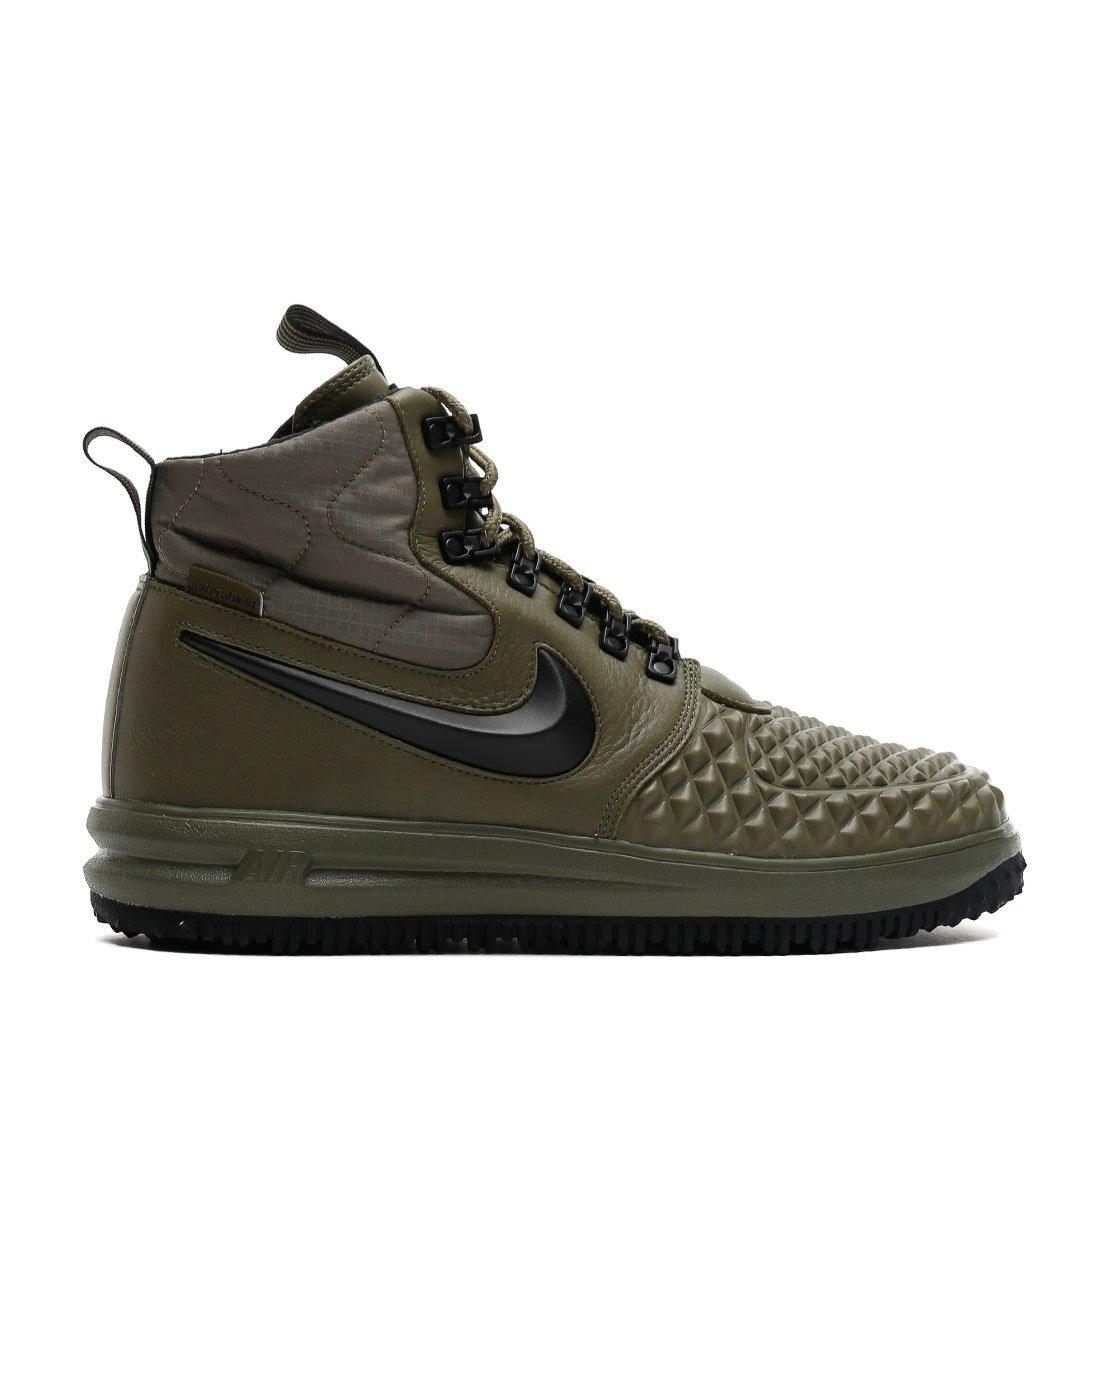 online retailer 27f11 8a741 Galleon - Nike Mens Lunar Force 1 Duckboot  17 Medium Olive Black-Wolf Grey  916682-202 Size 12